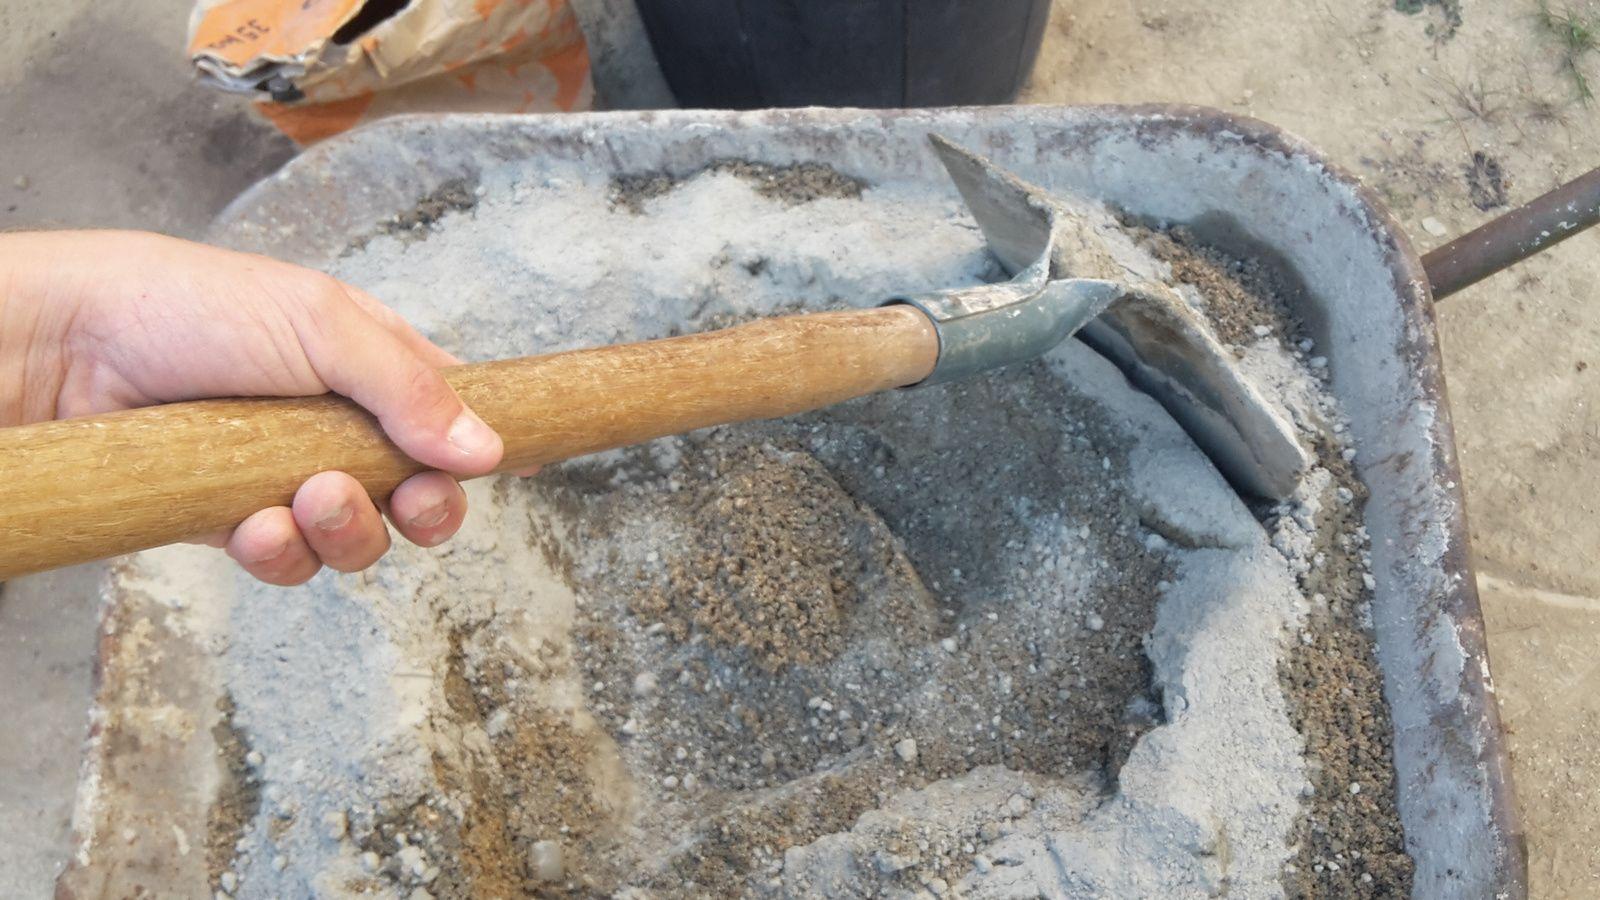 béton ou mortier pour sceller